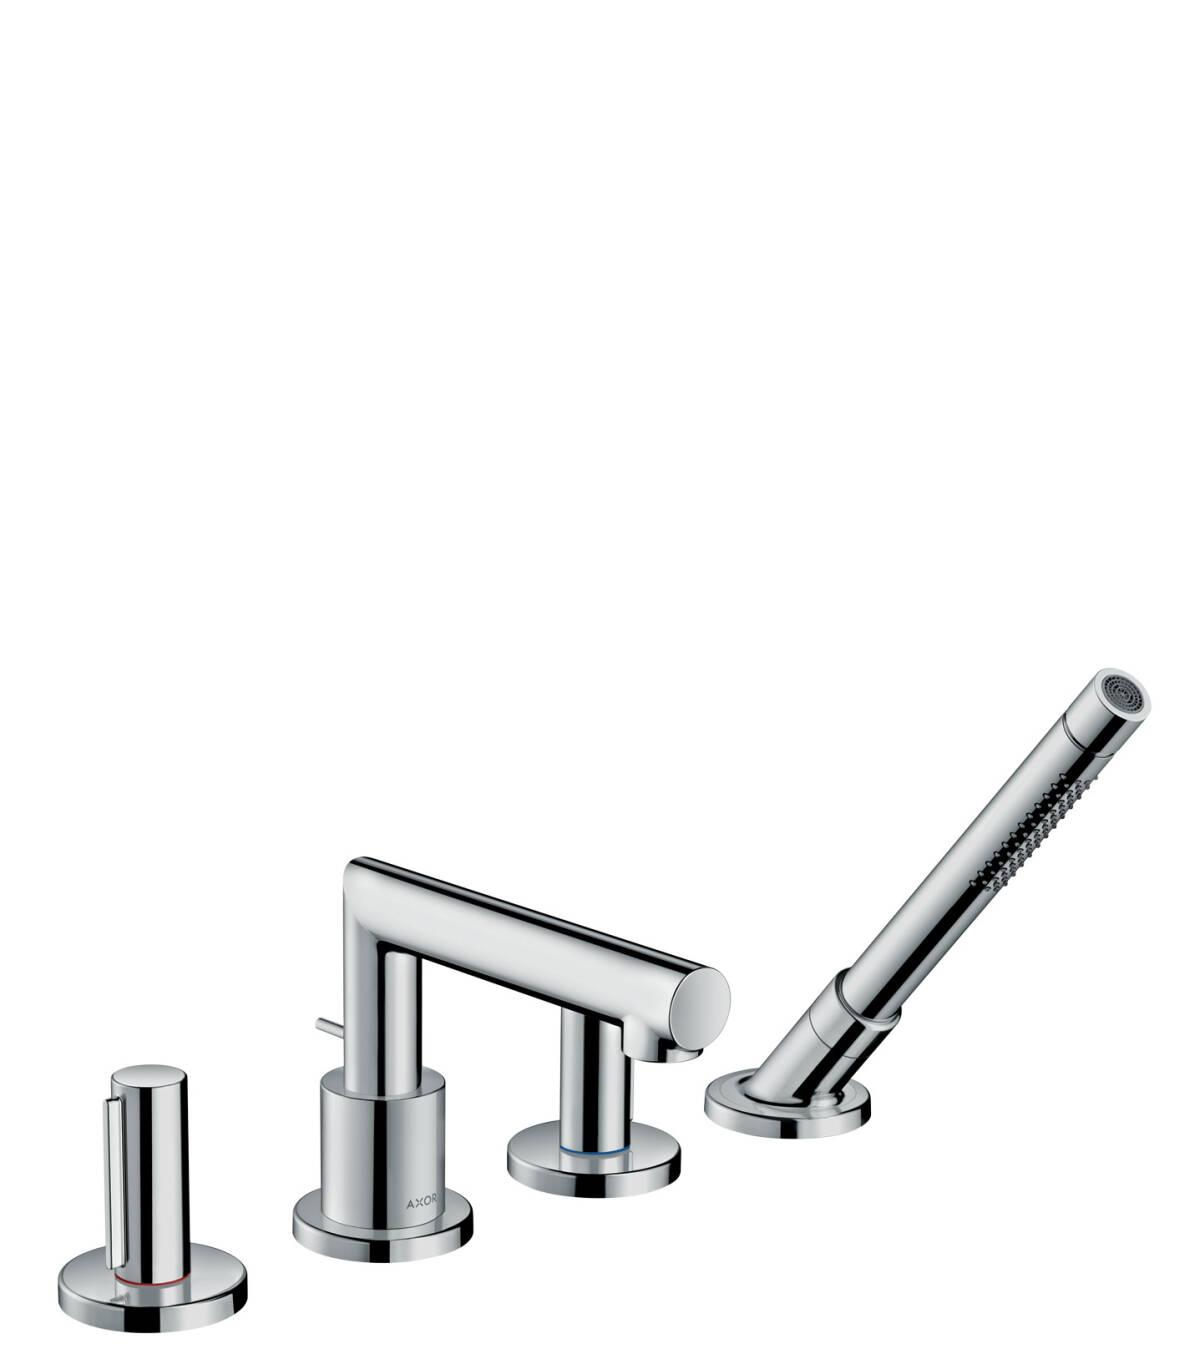 4-hole rim mounted bath mixer with zero handles, Chrome, 45444000